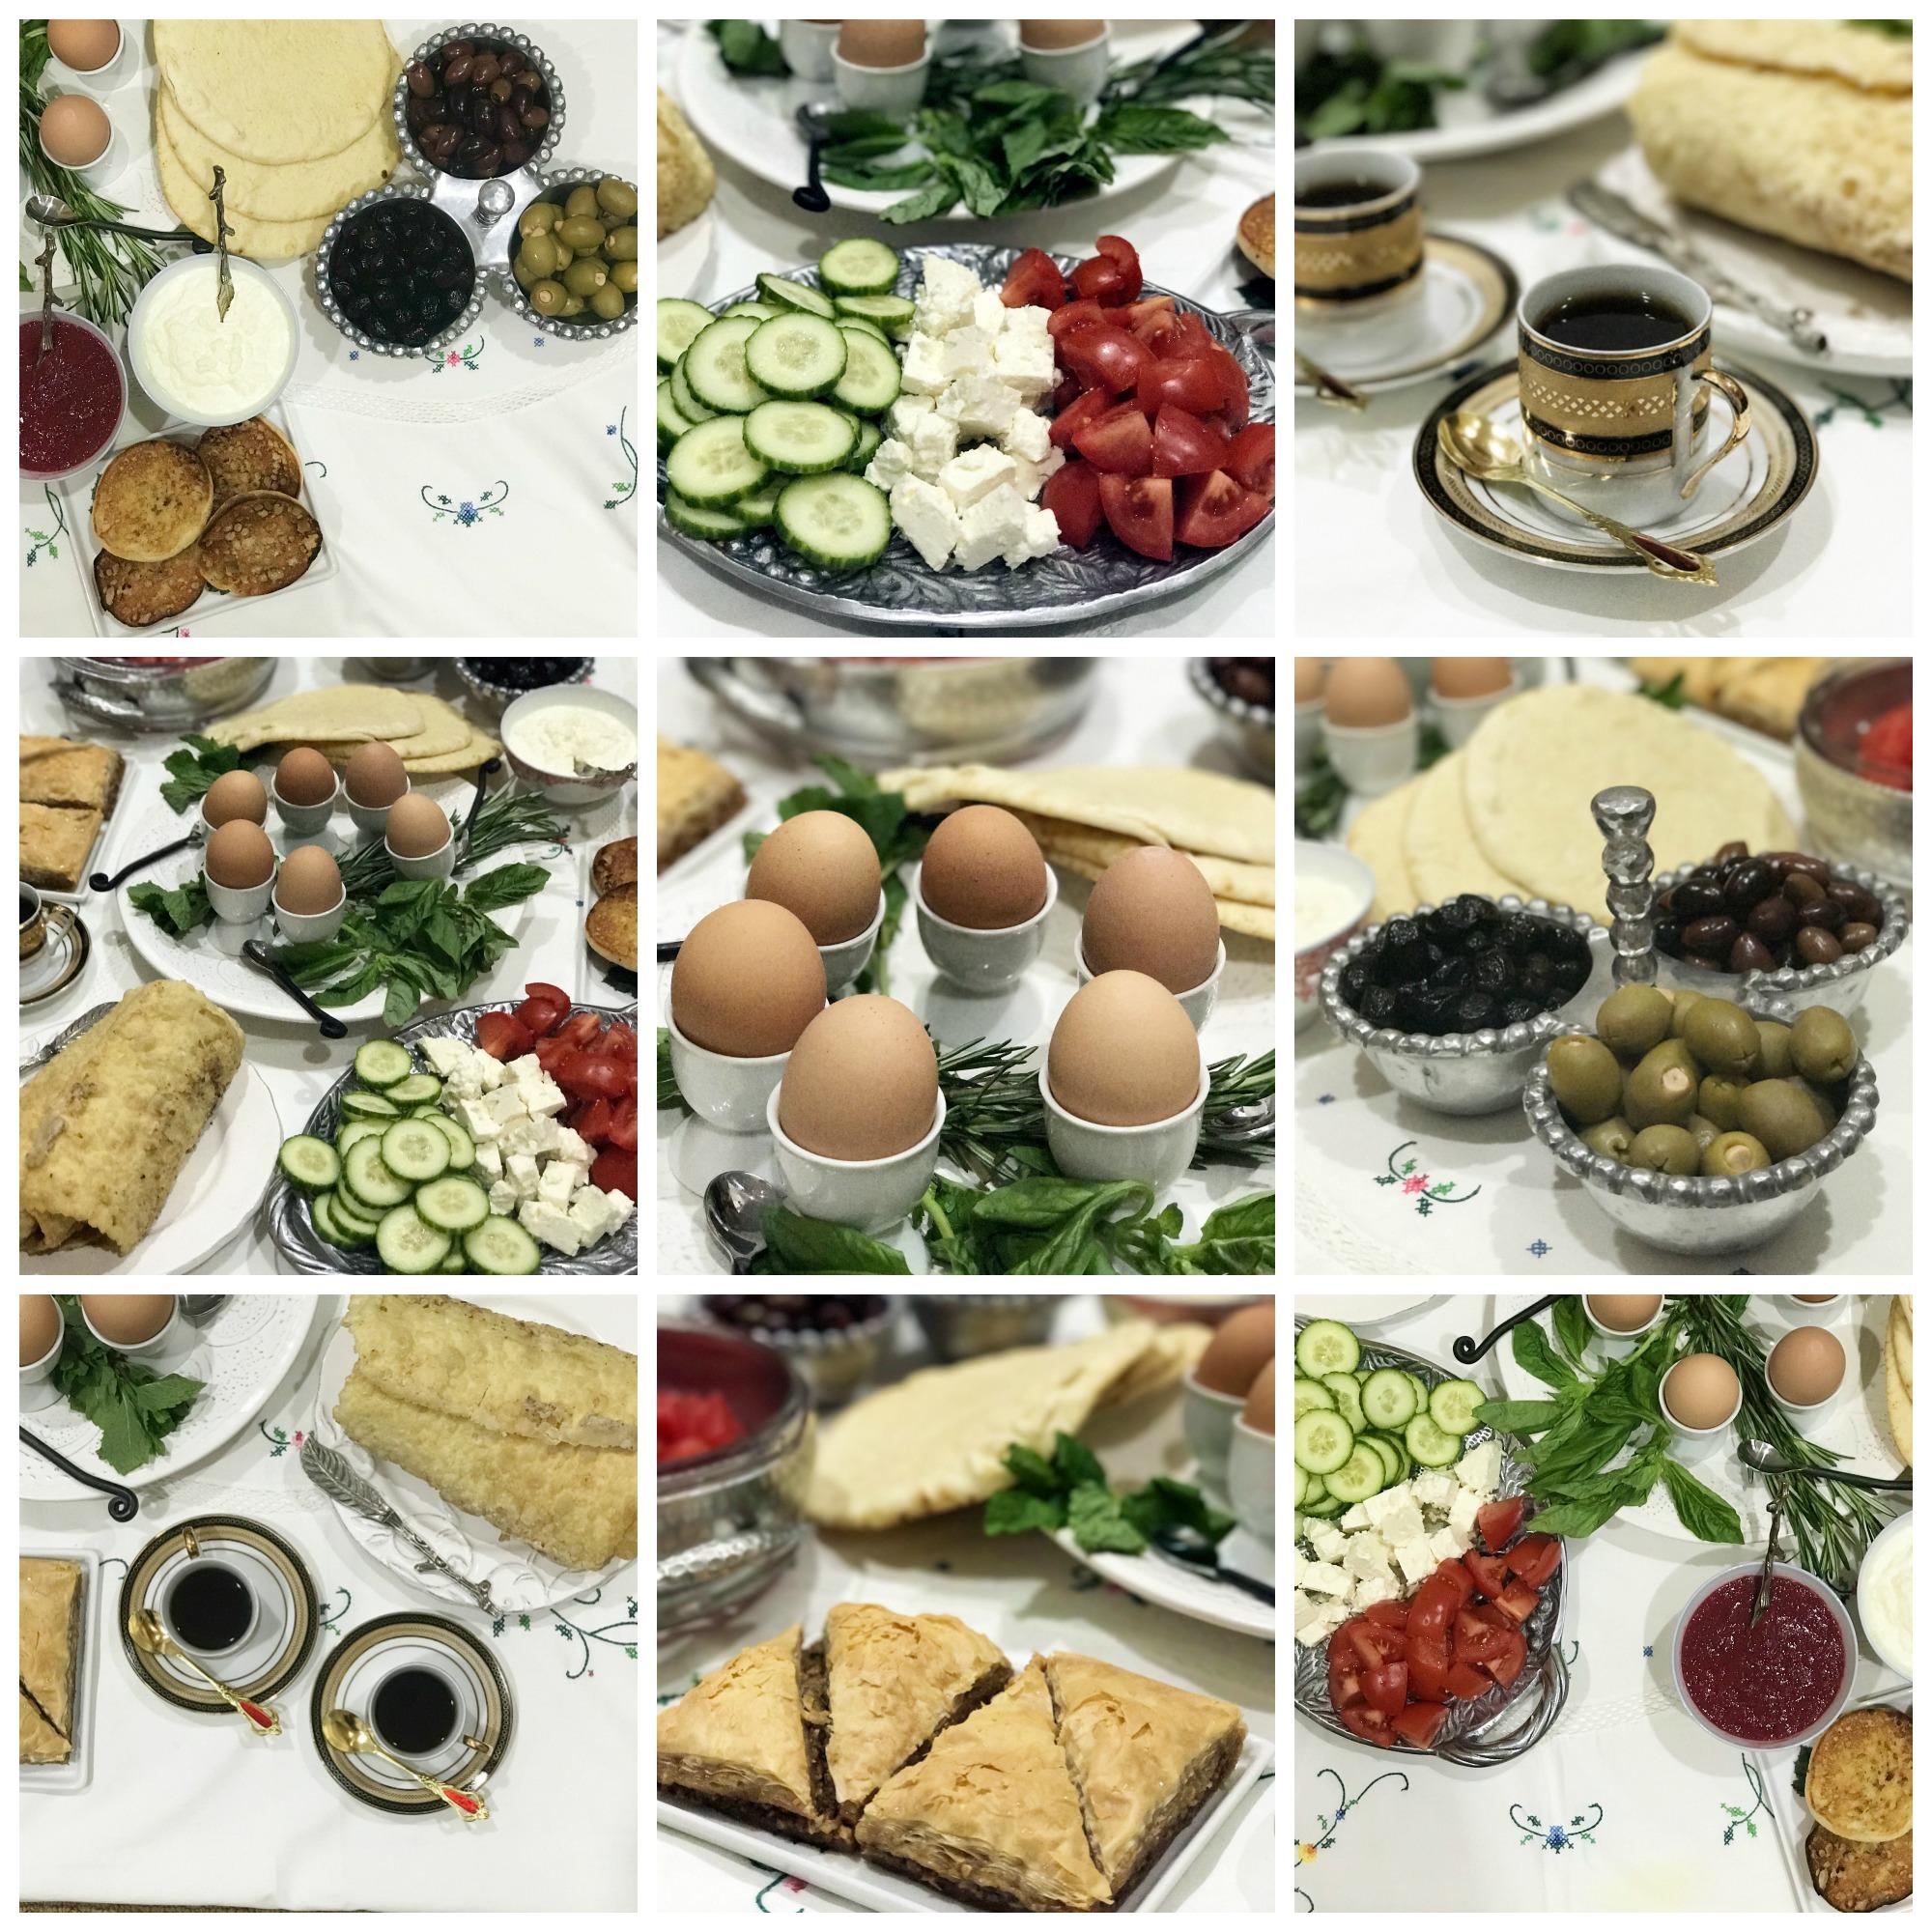 turkish breakfast foods